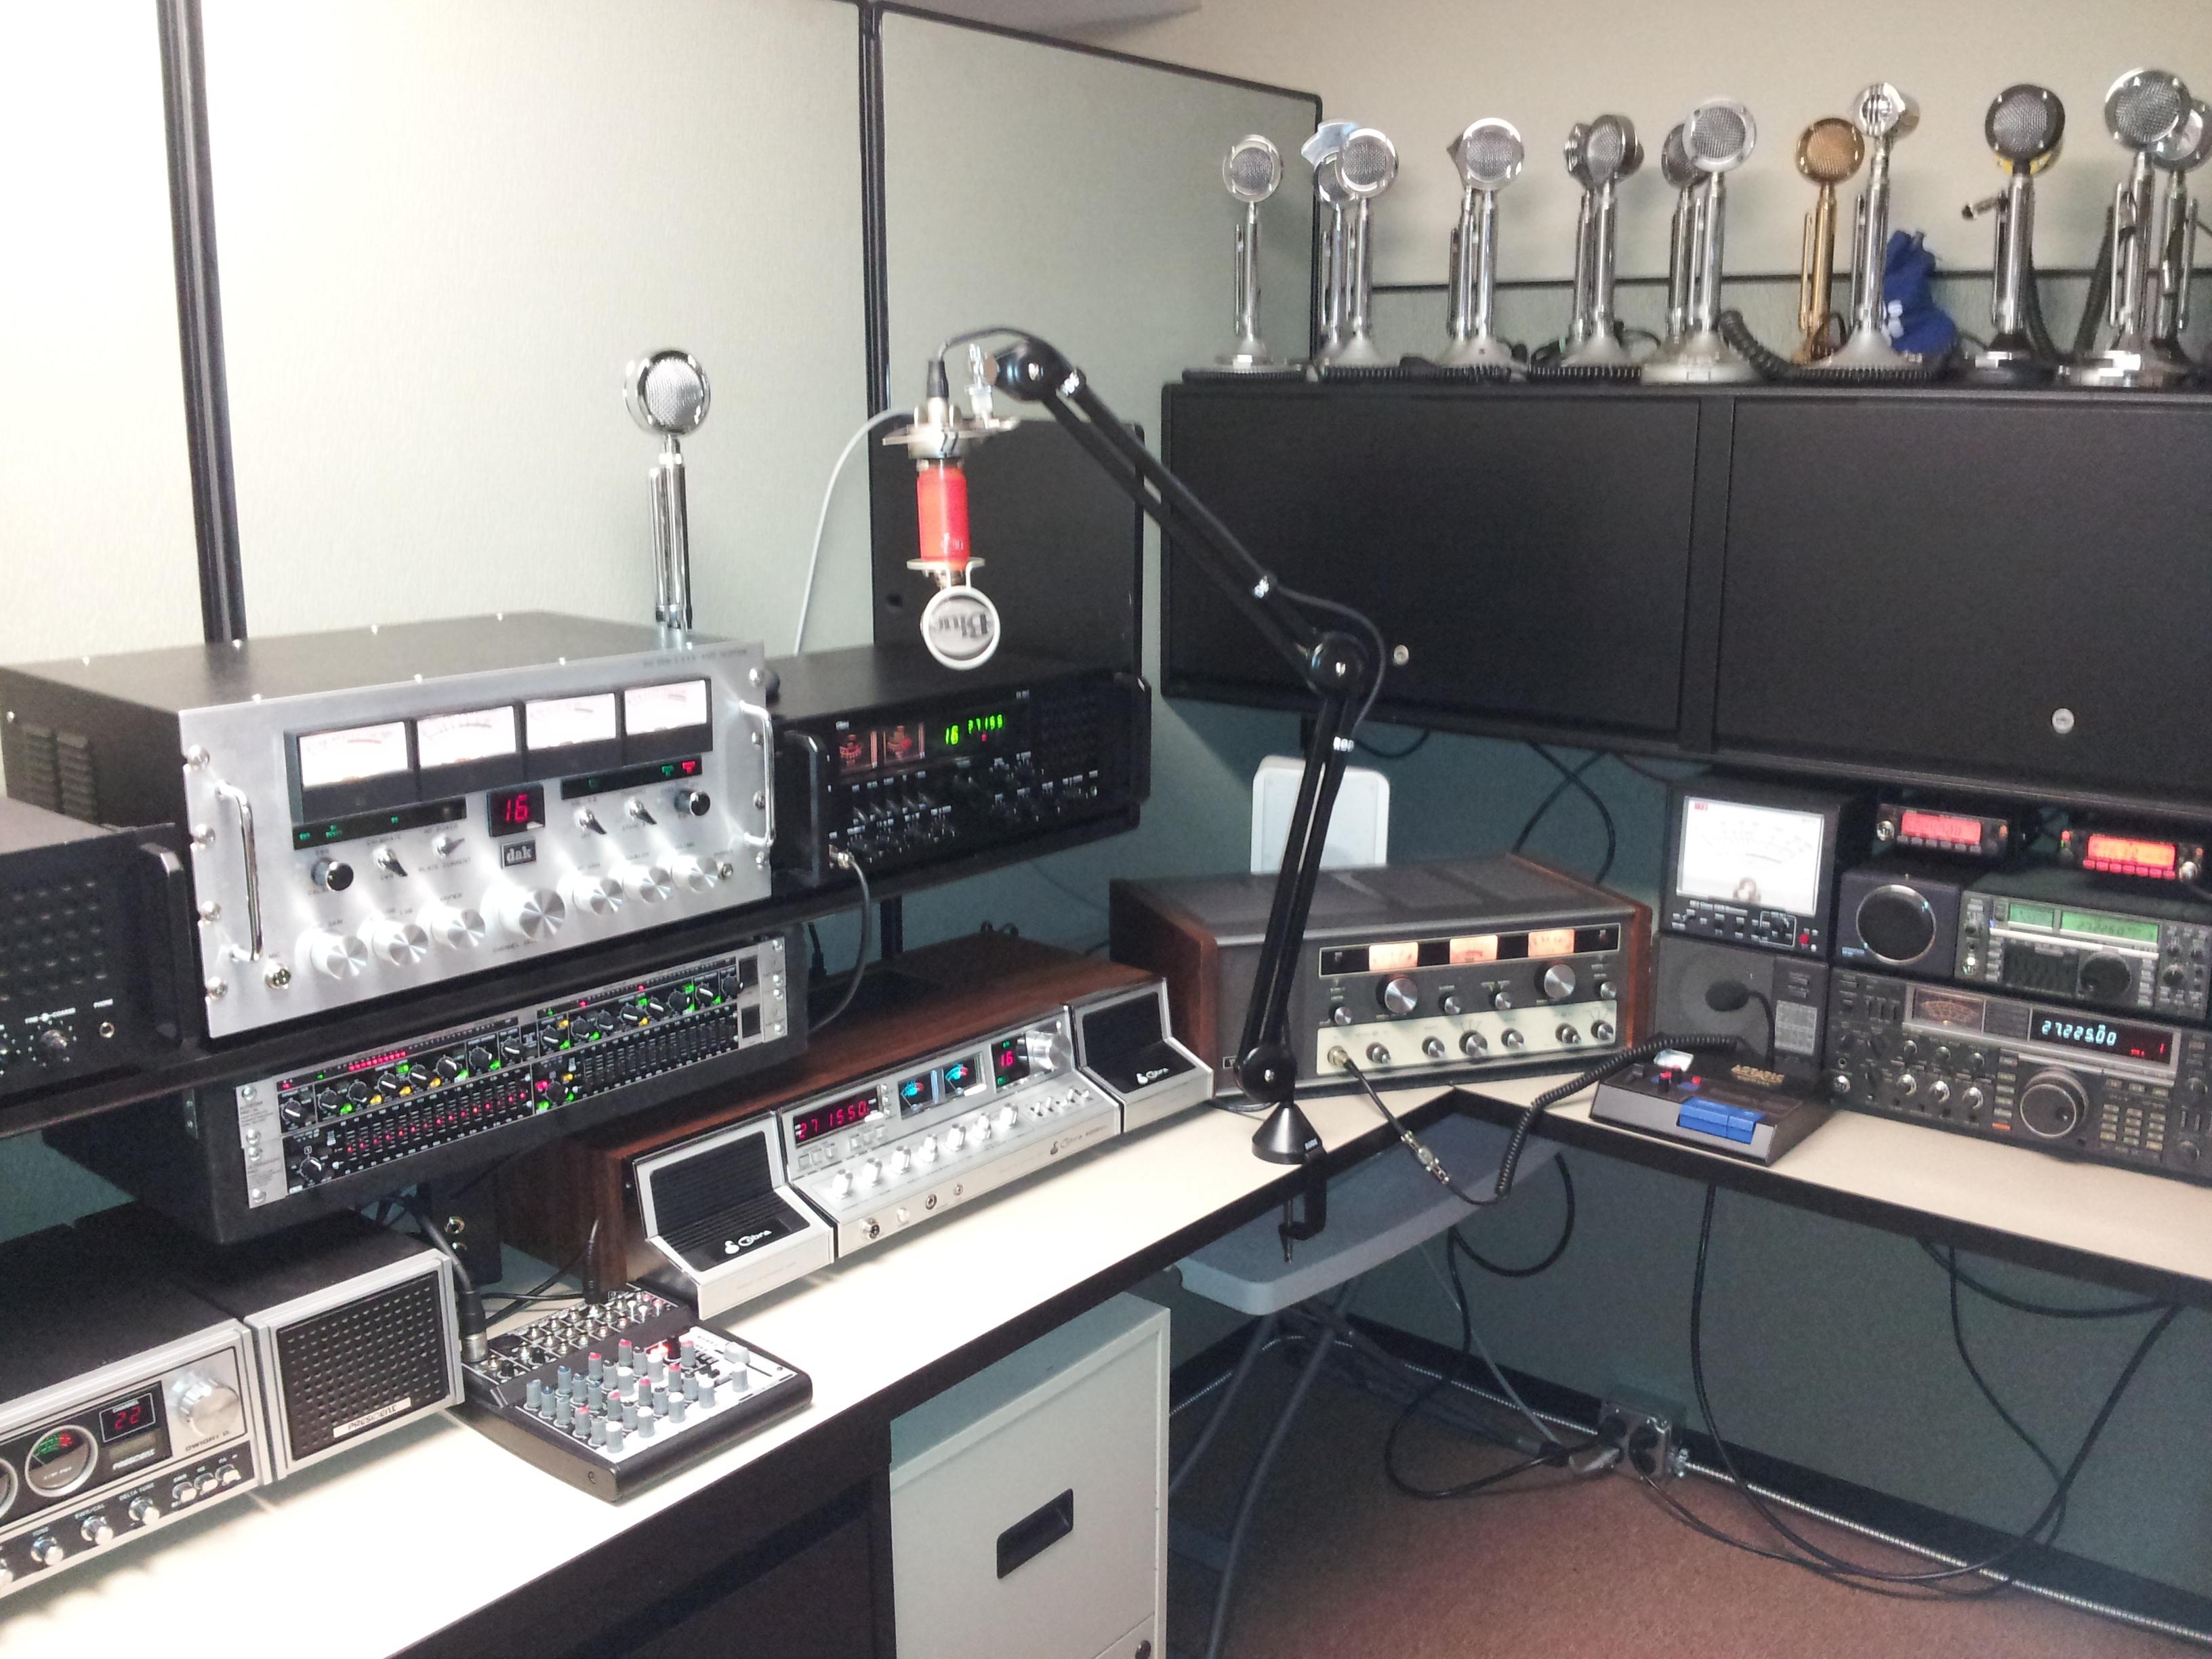 Custom Builds Cb Radio Mixer Wiring Garys Shack